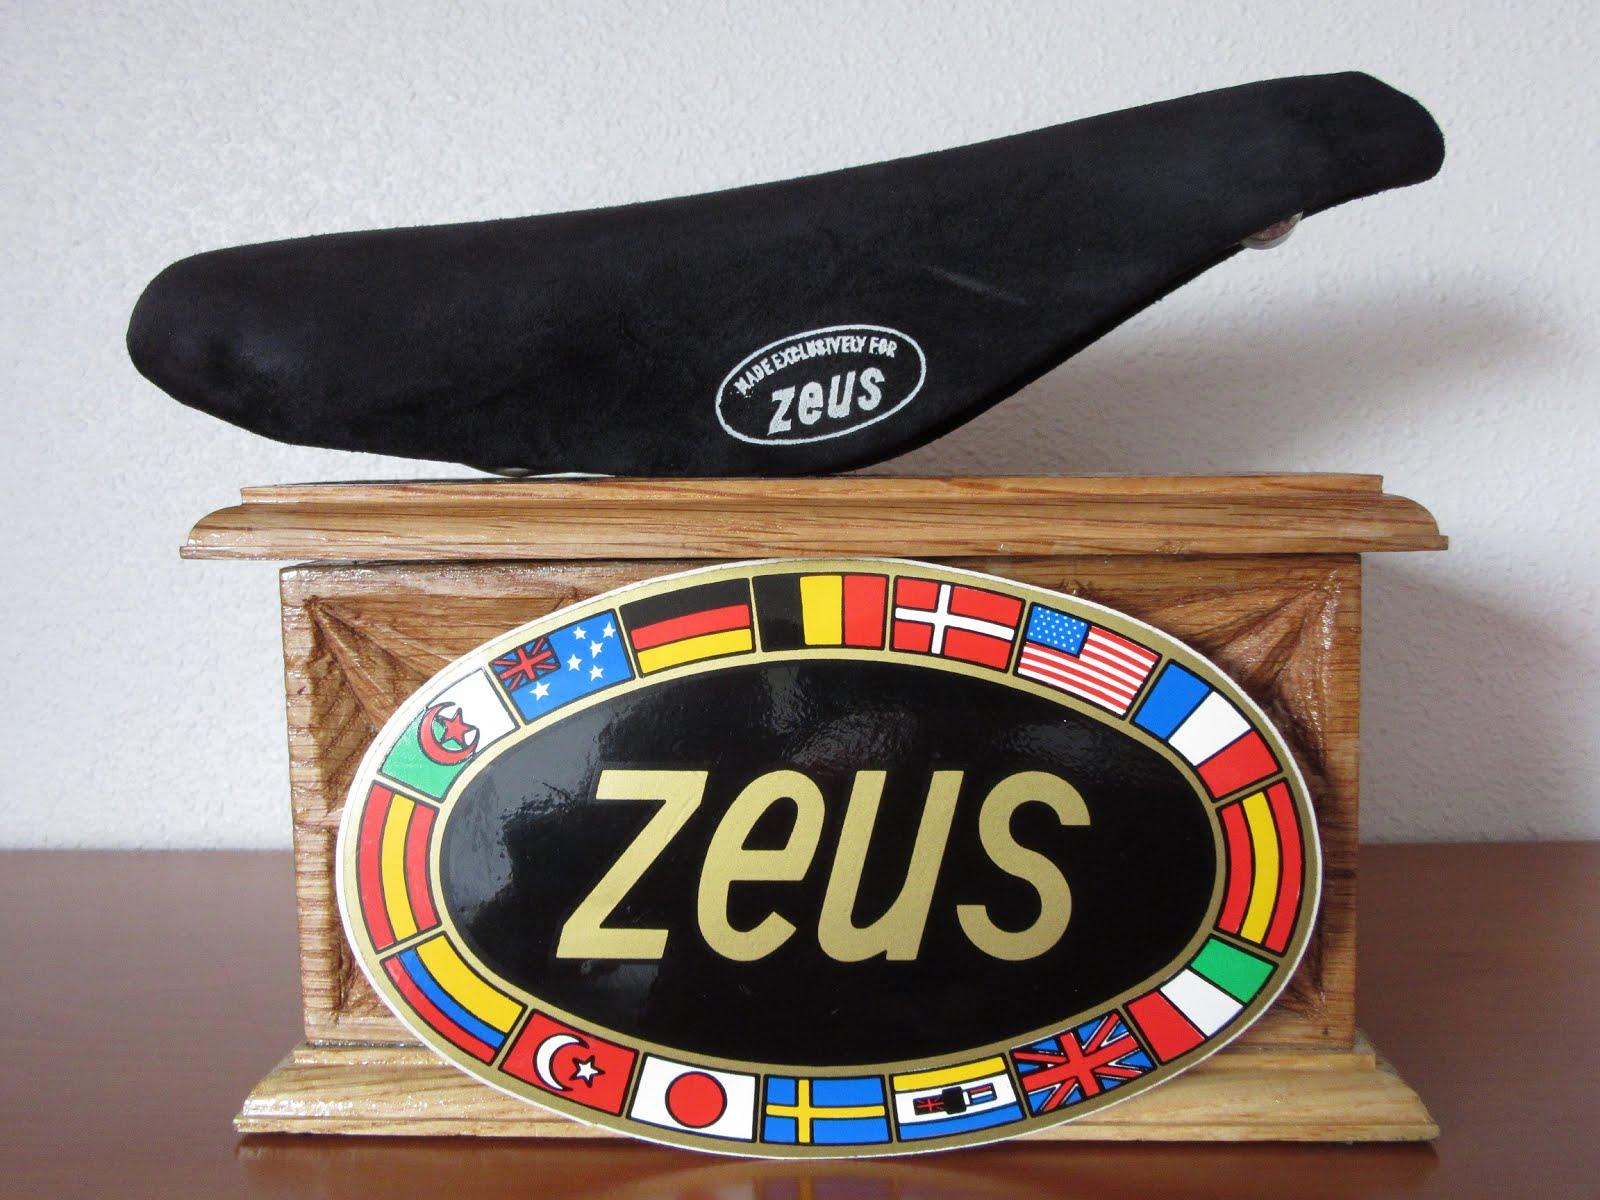 Sillin - Zeus Pista